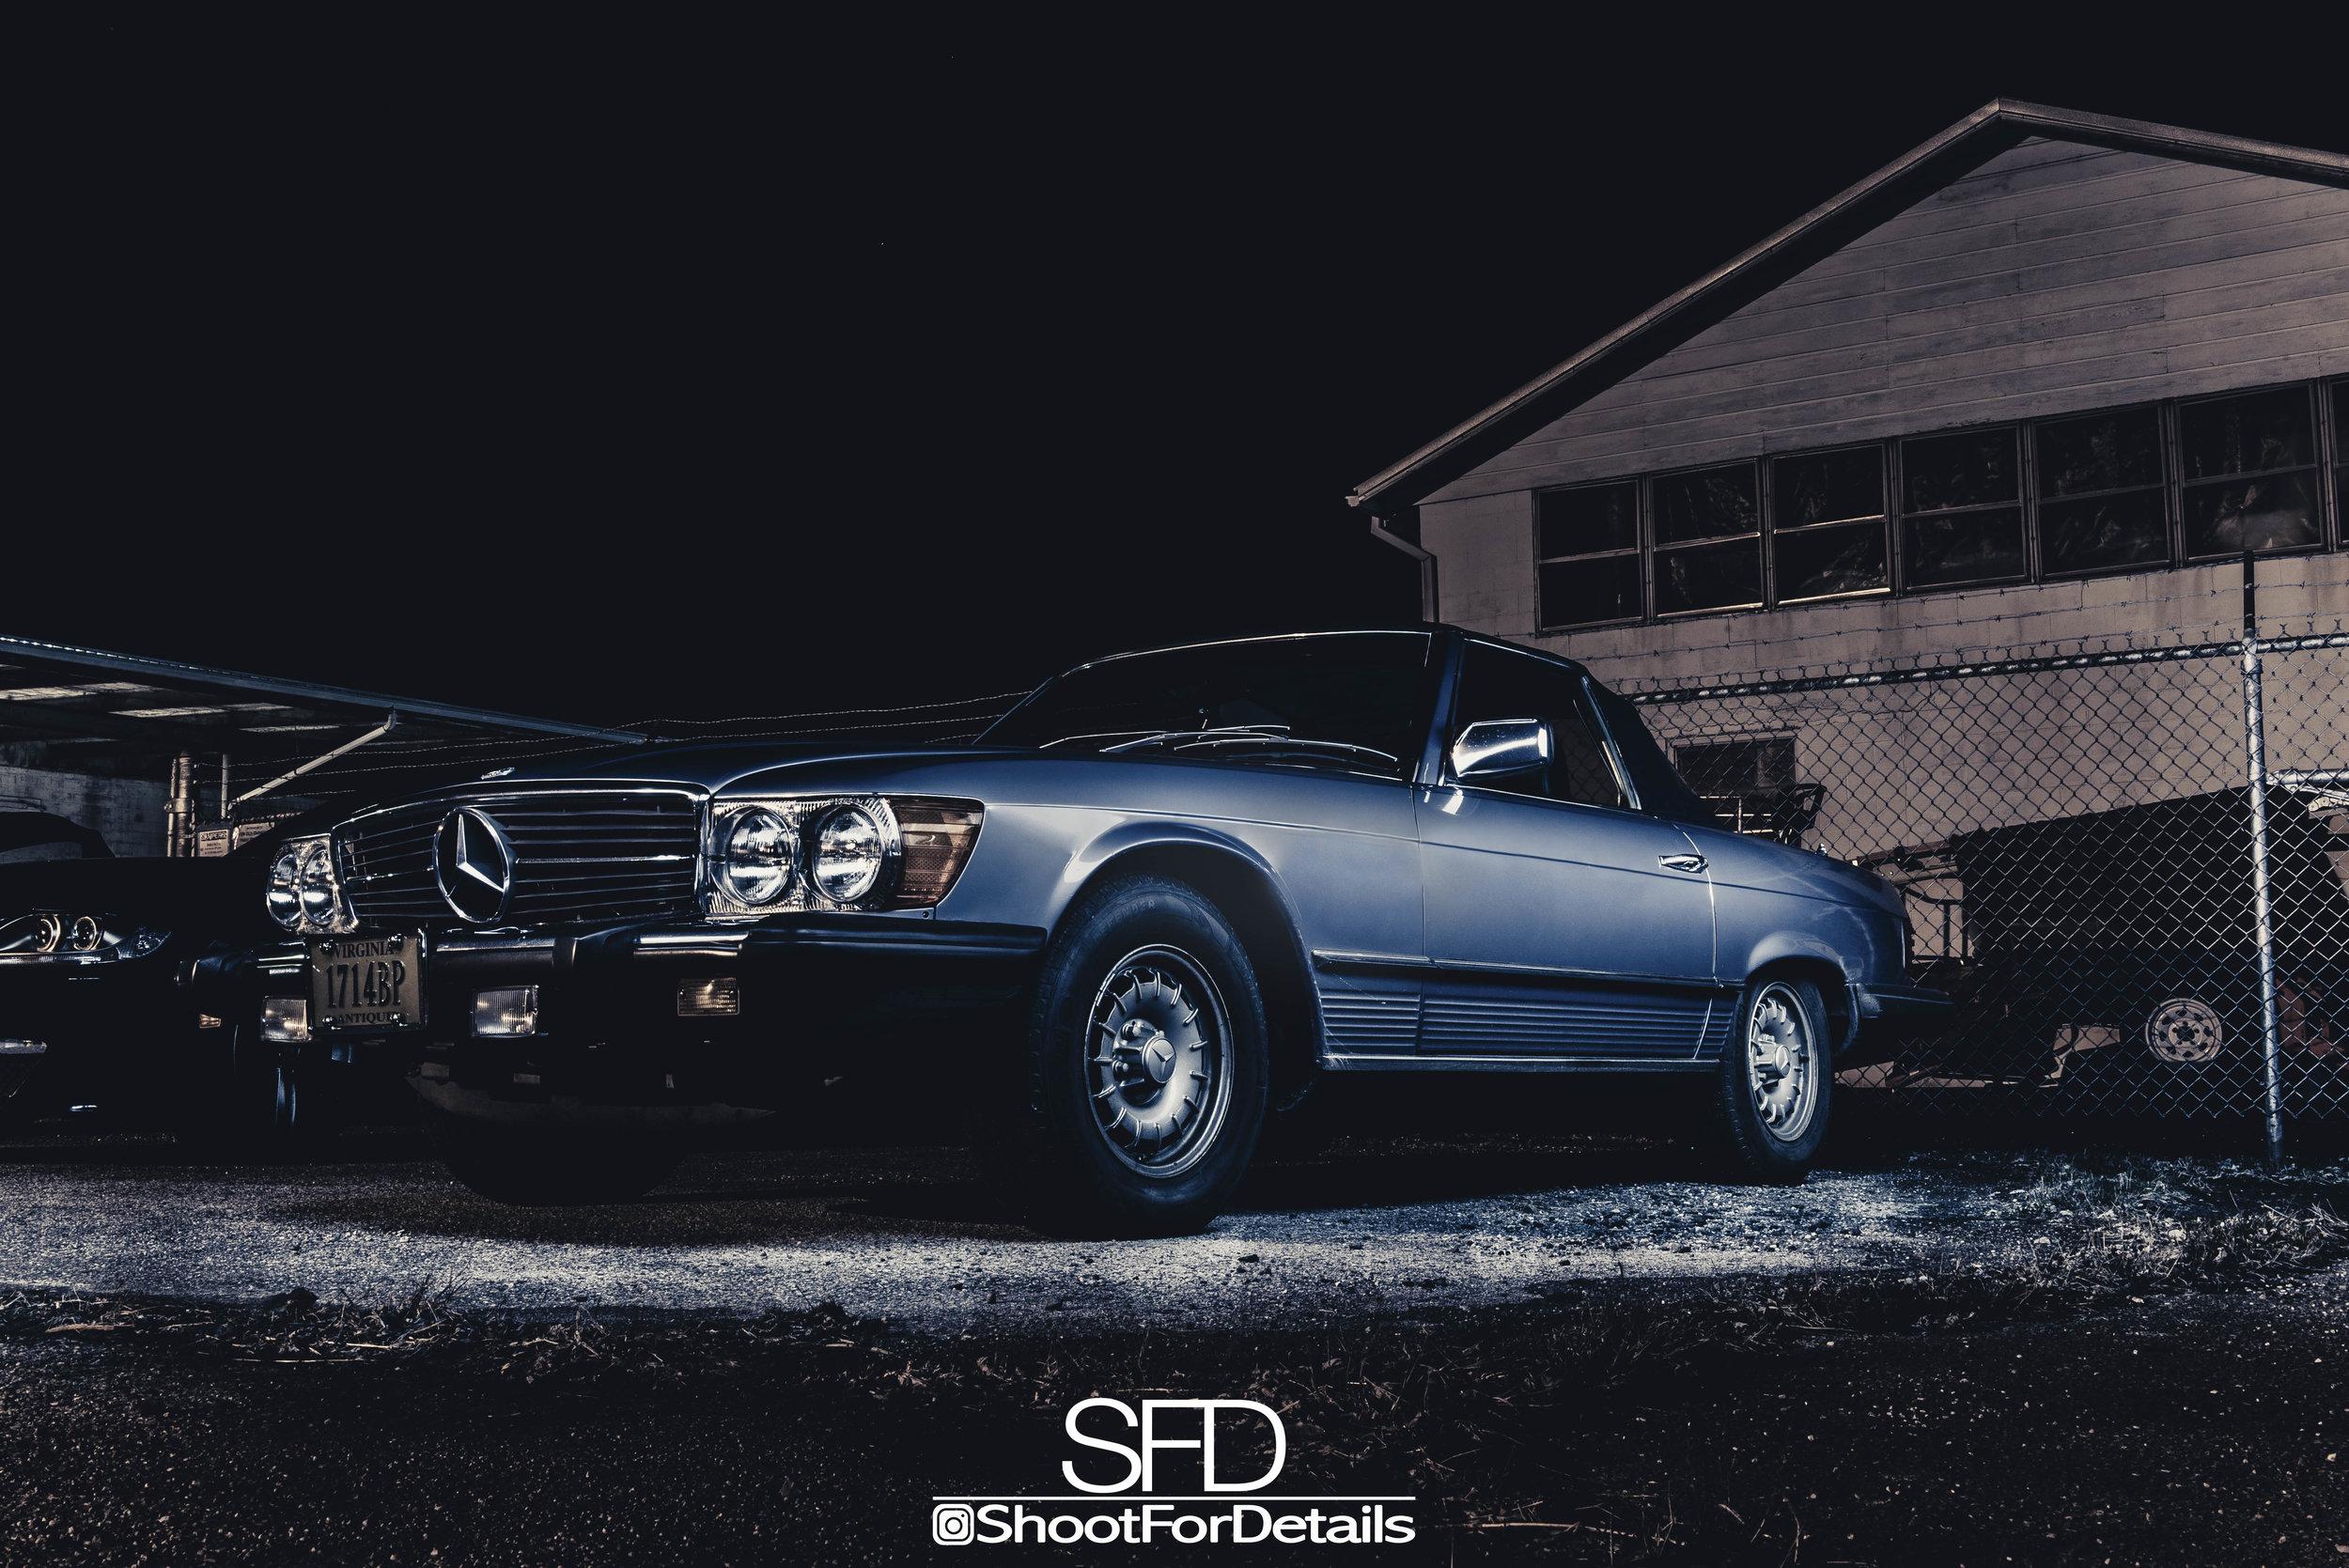 SFD_7985-Edit.jpg